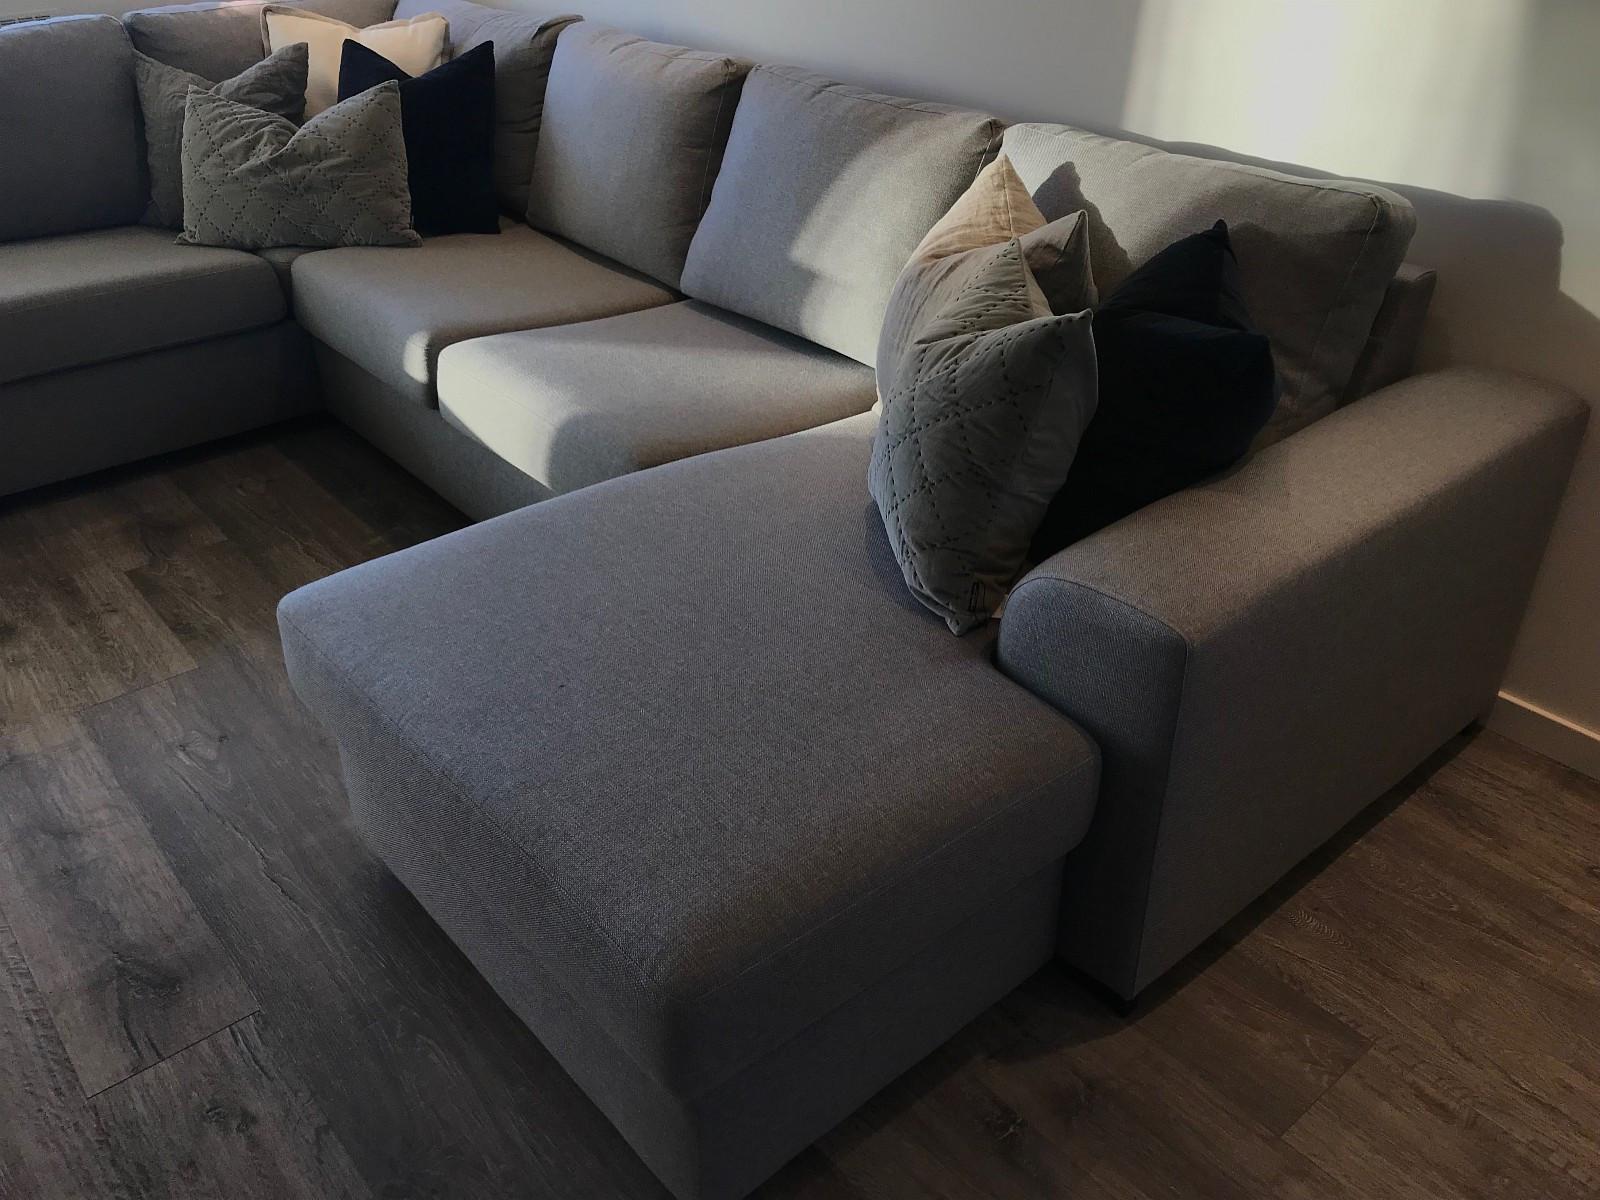 hvordan vaske sofa